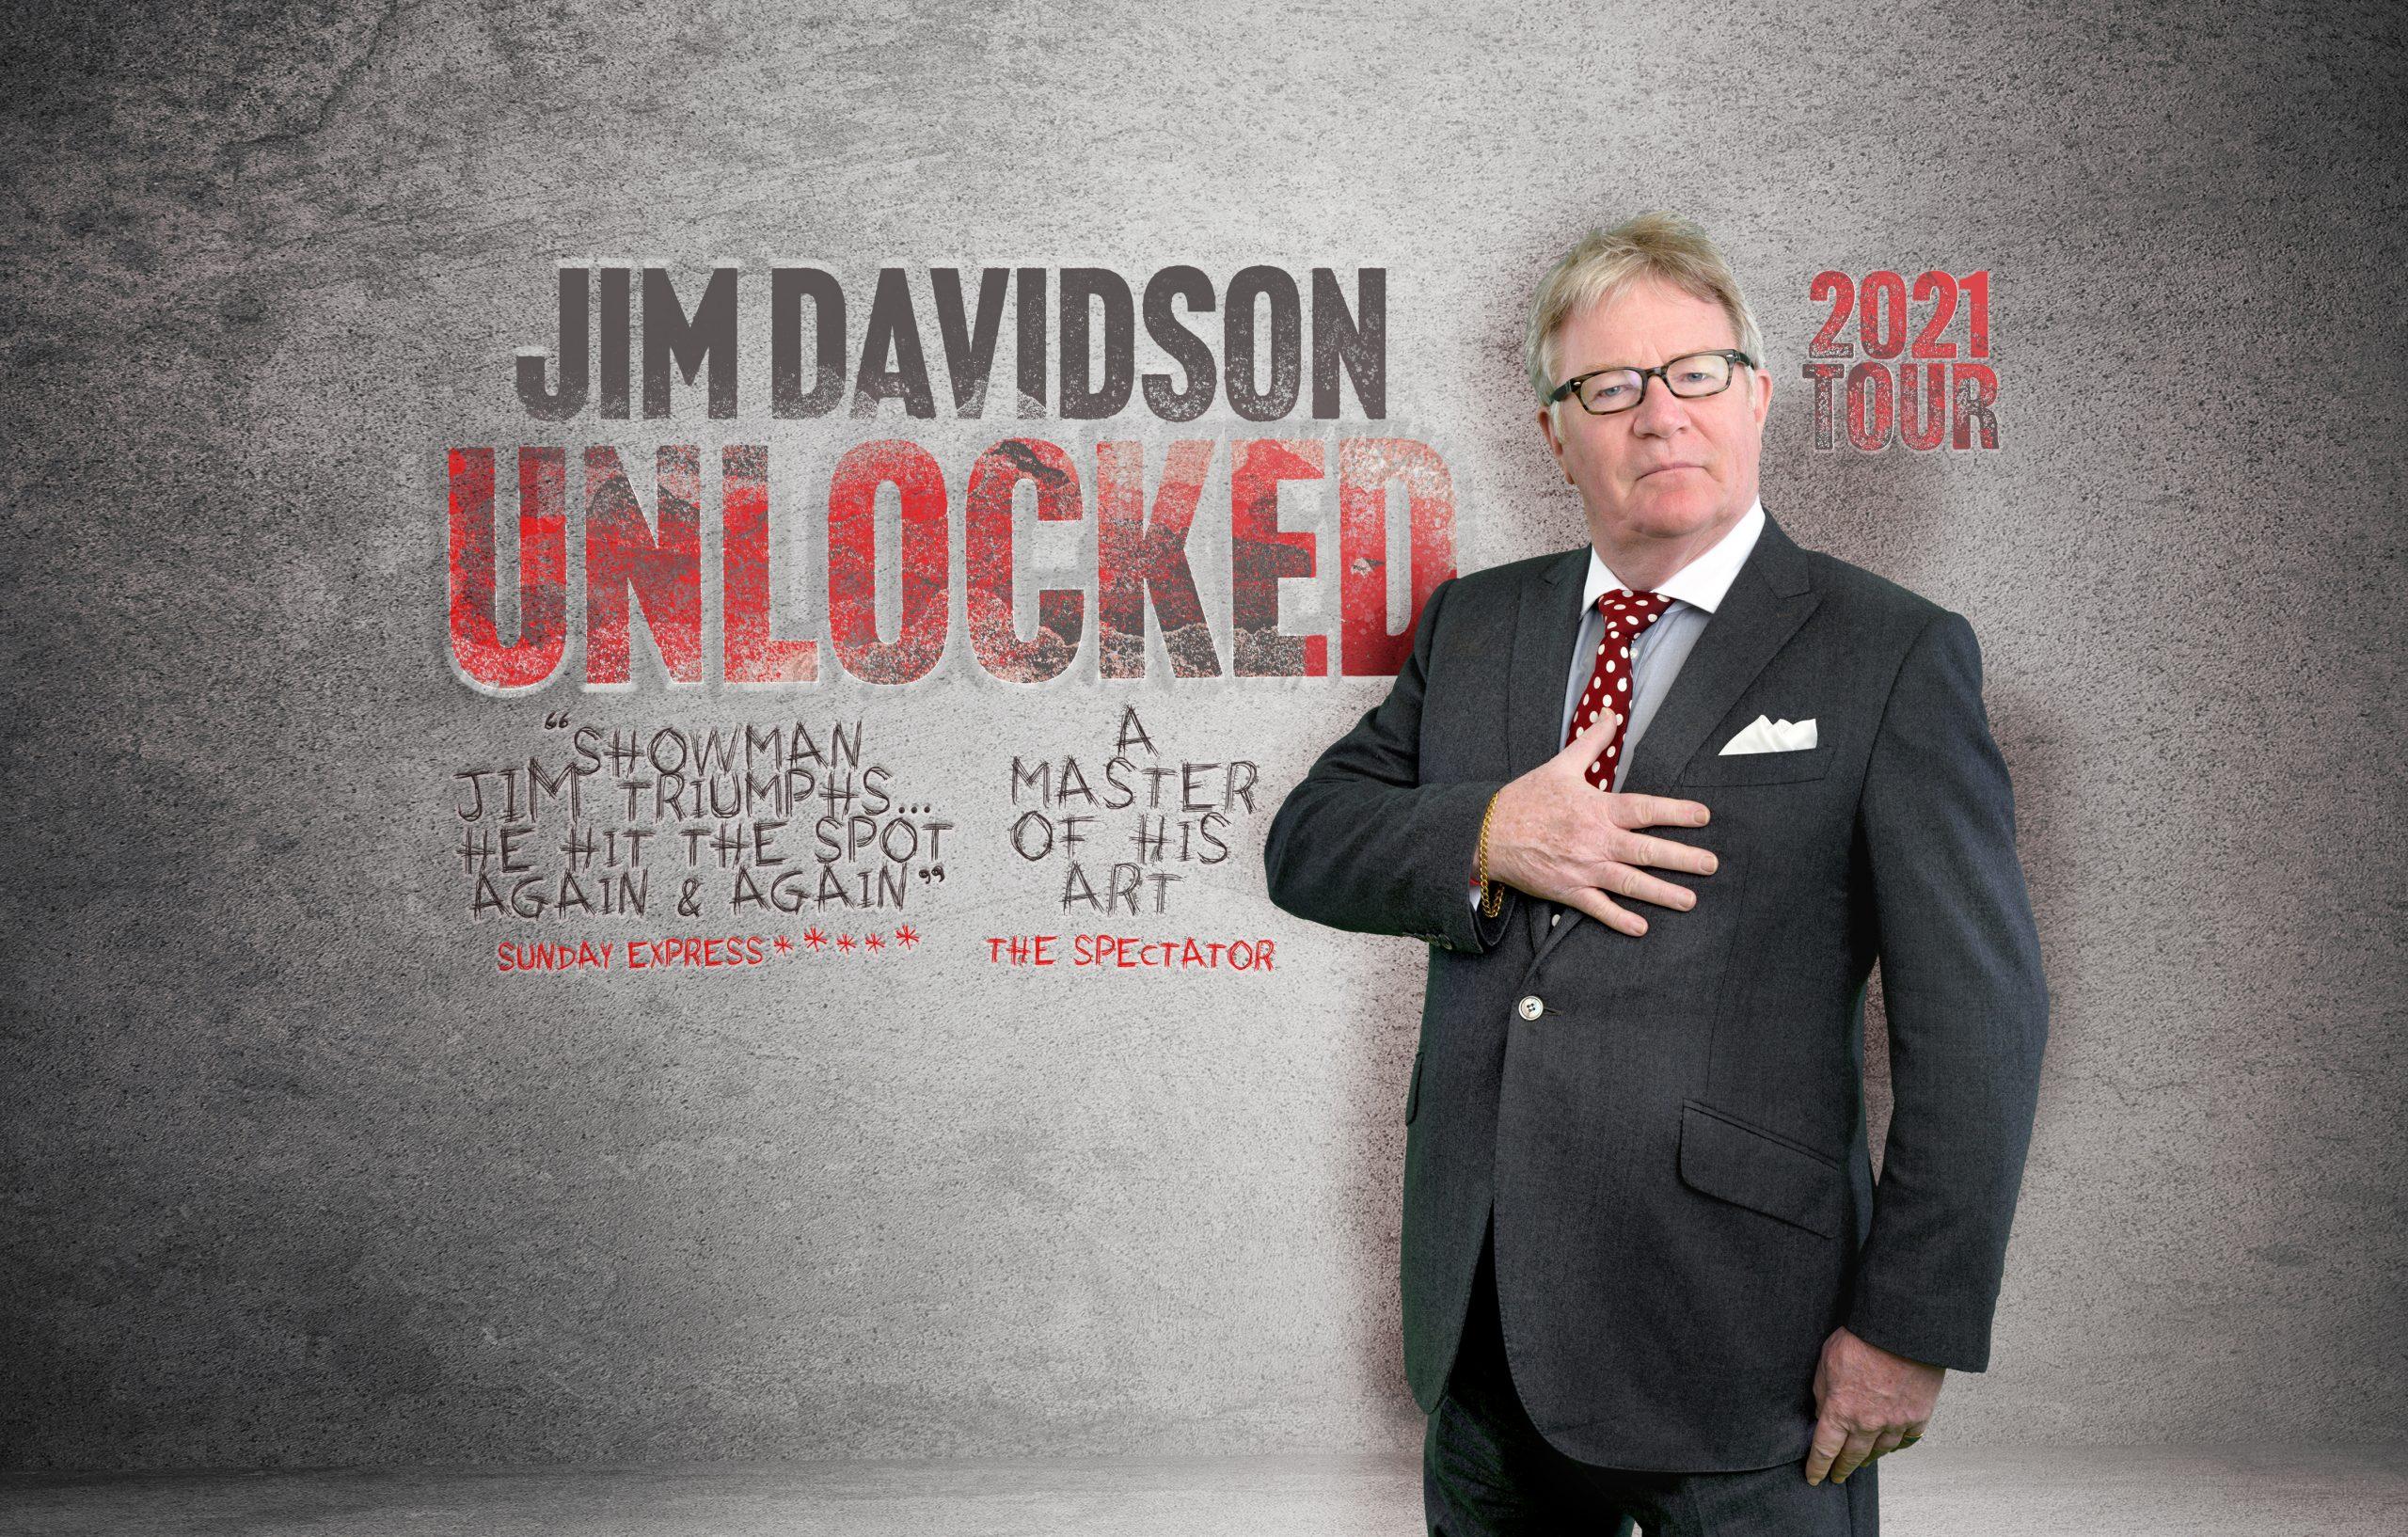 Jim Davidson Unlocked web assets landscape 1